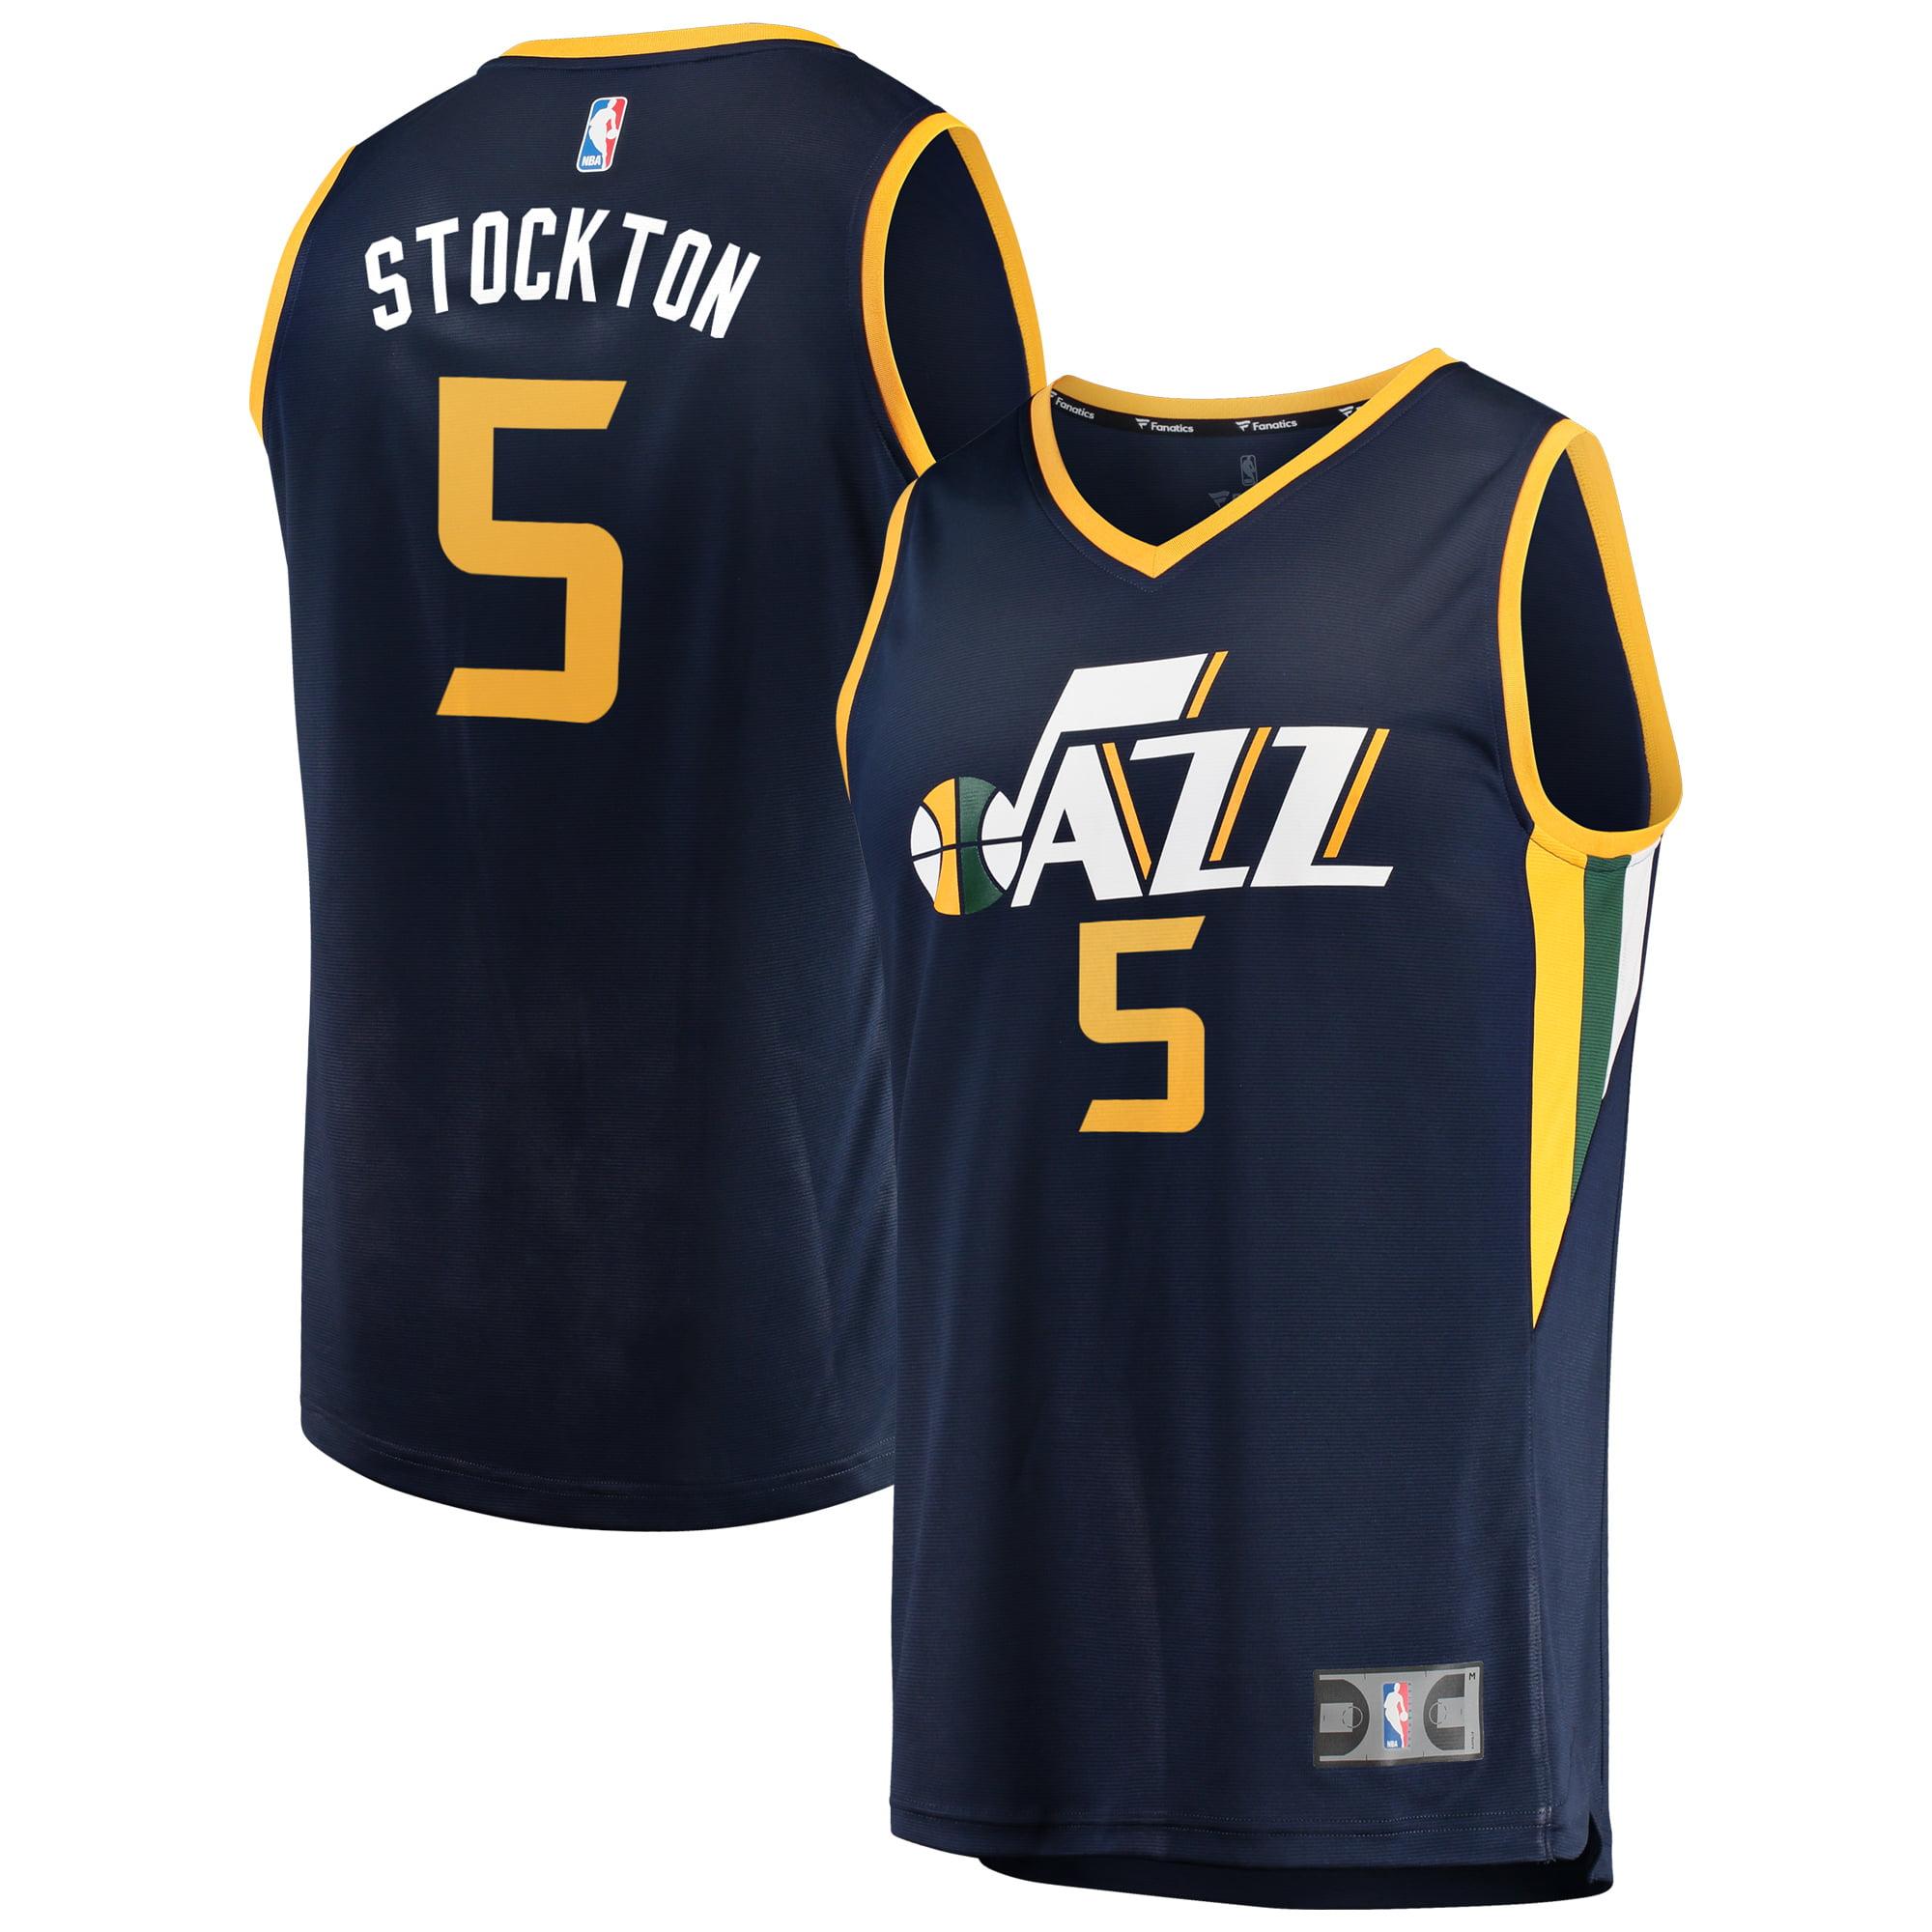 uk availability 2bcf3 fdaee David Stockton Utah Jazz Fanatics Branded Fast Break Player Jersey - Icon  Edition - Navy